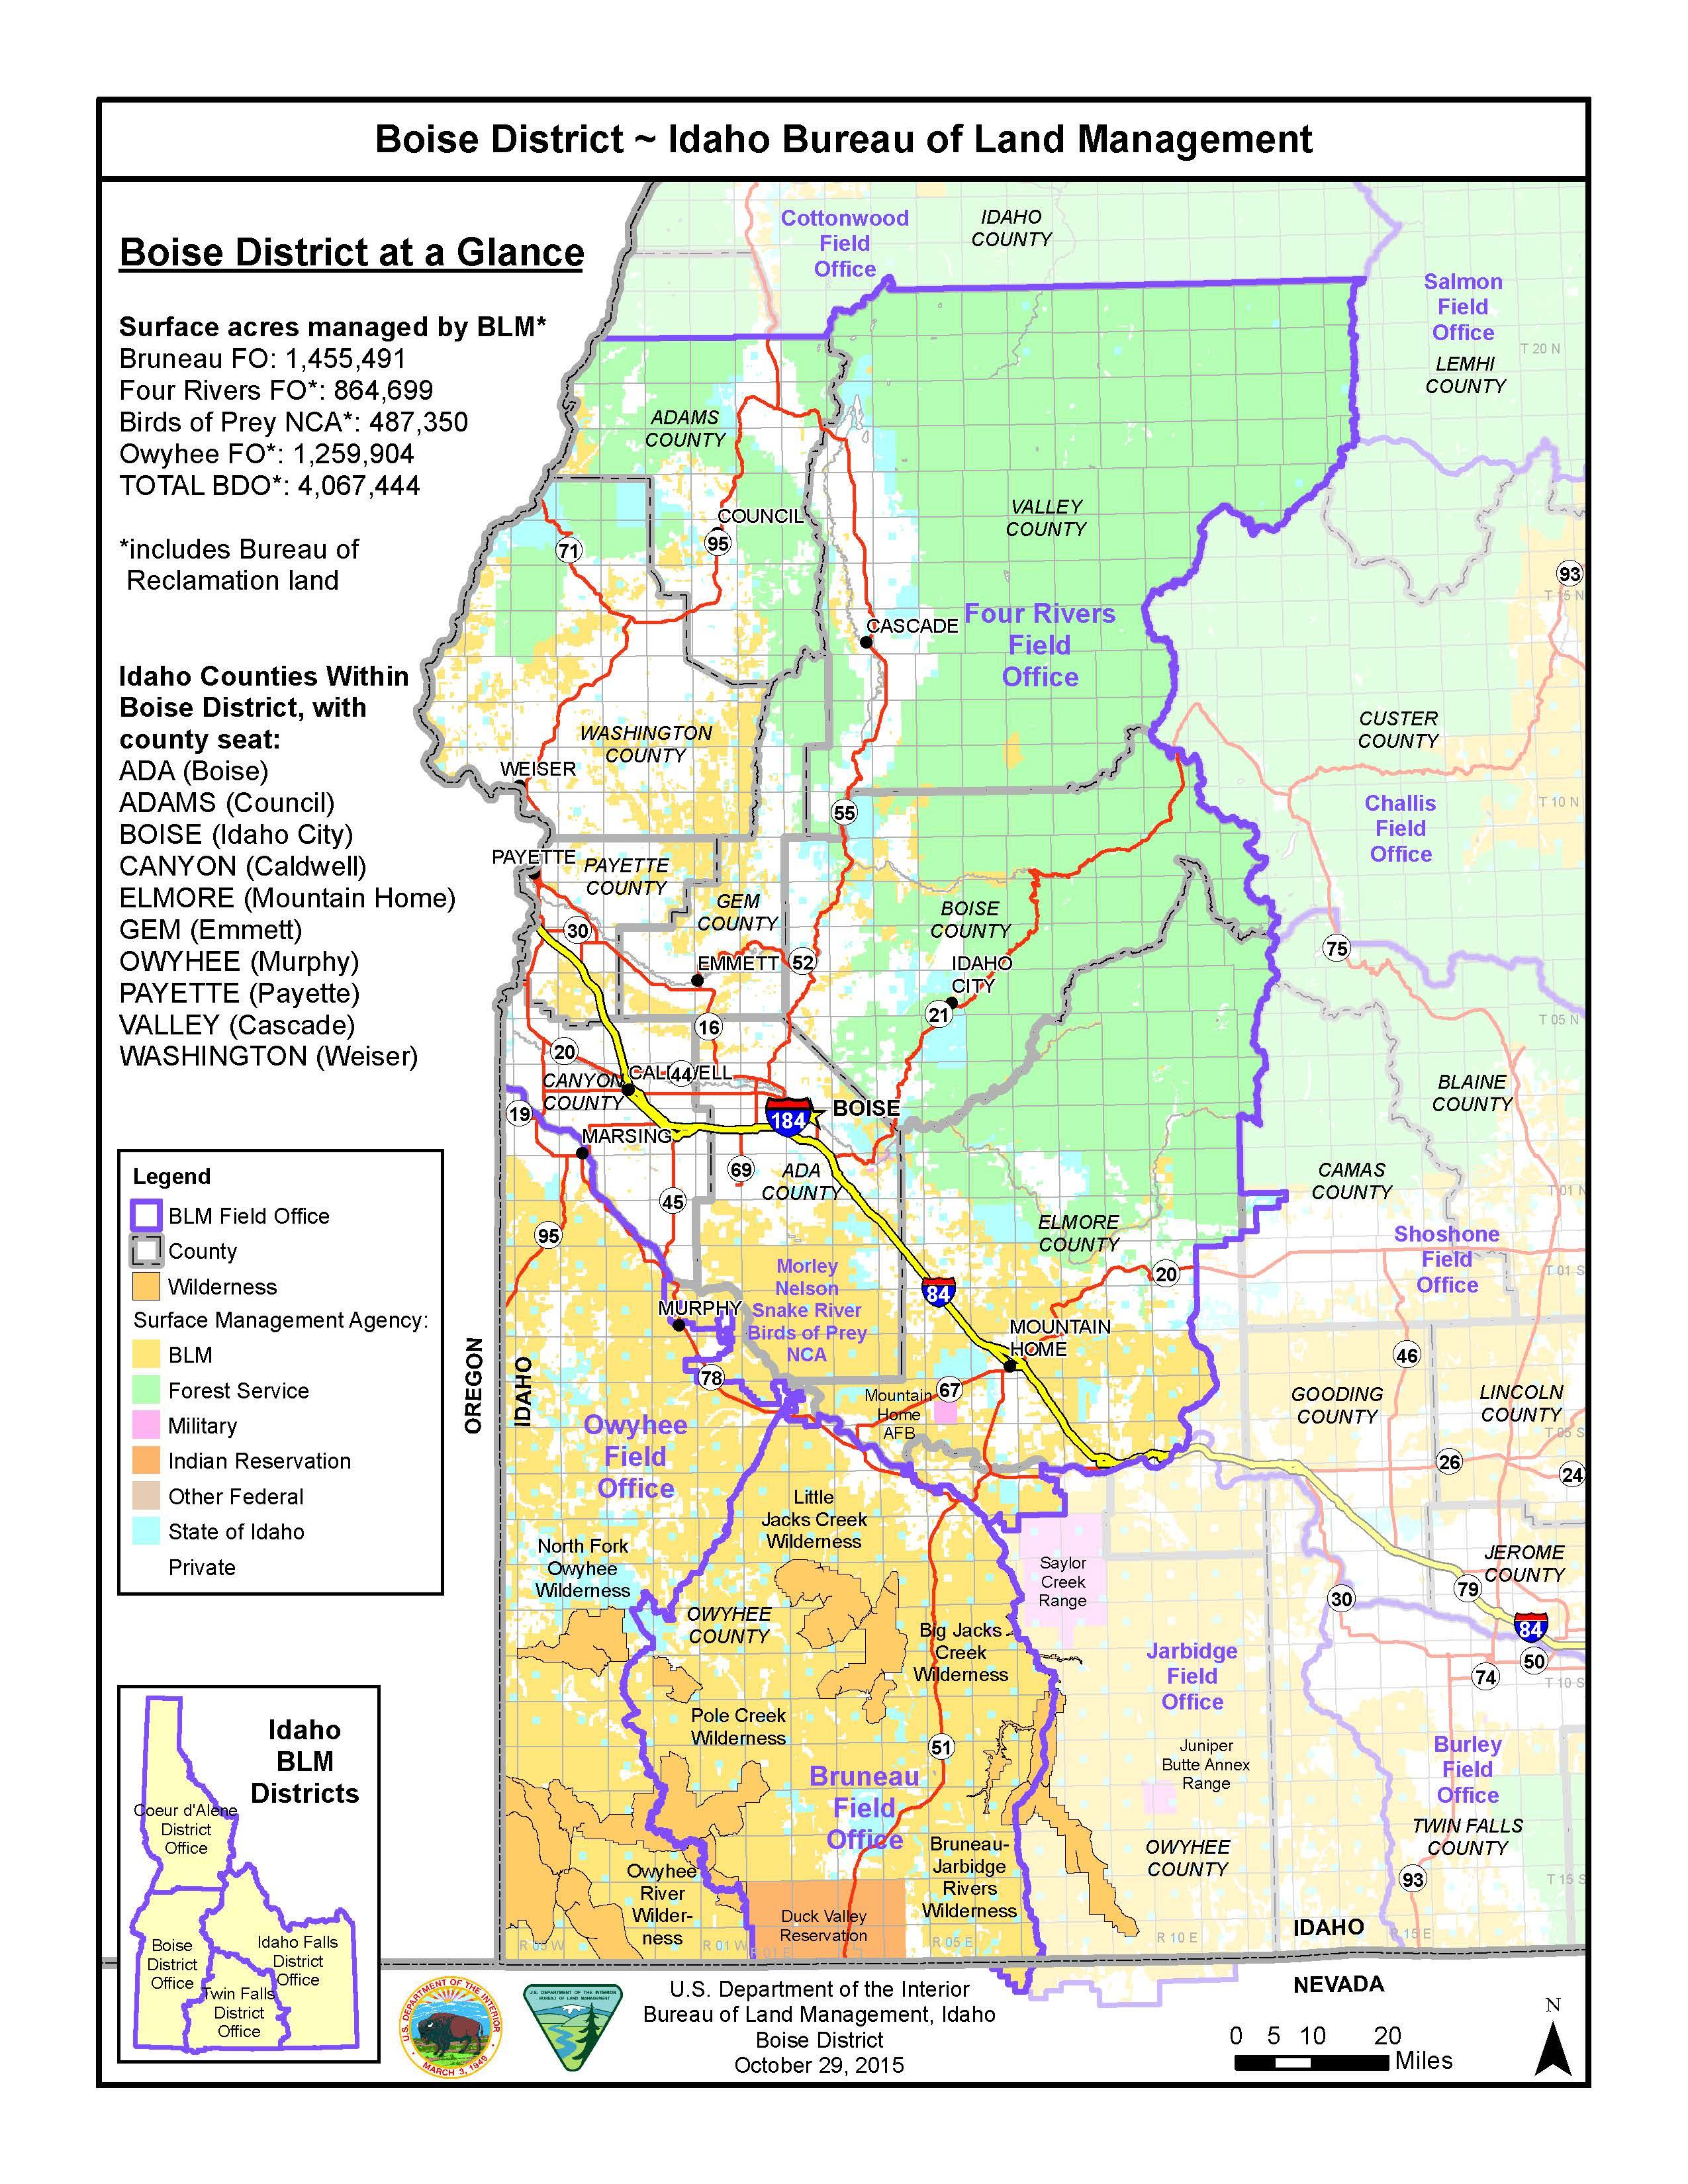 Blm Land Map Idaho Media Center: Public Room: Idaho: Boise District Map | Bureau of